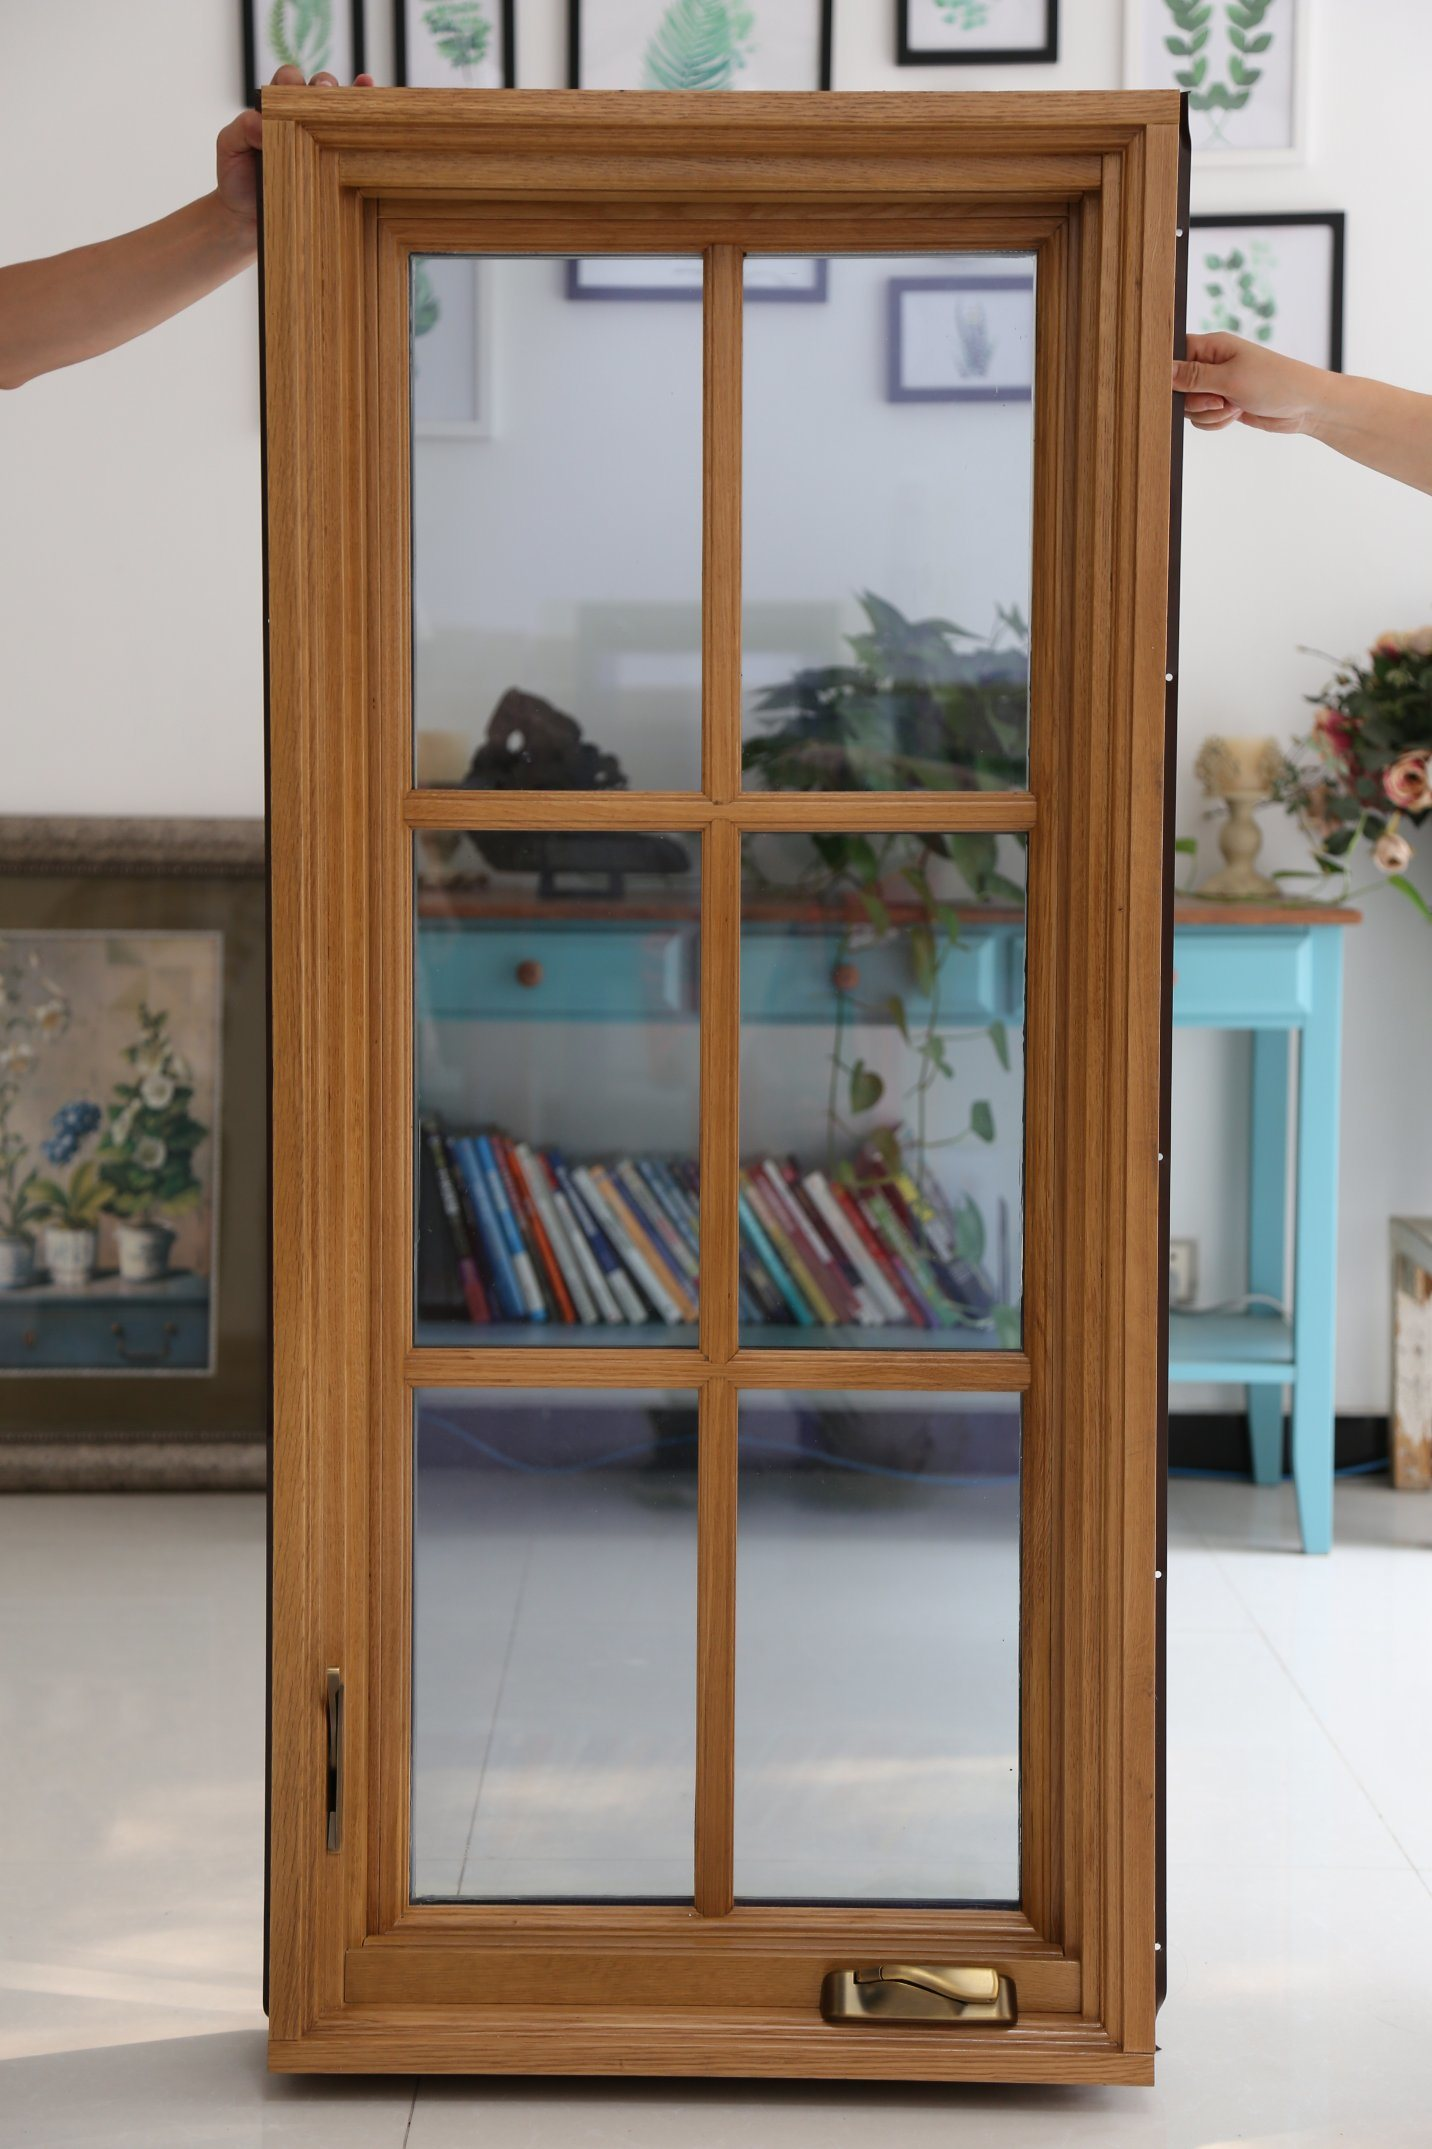 America Style Casement Wood Aluminum Window with Crank Operator